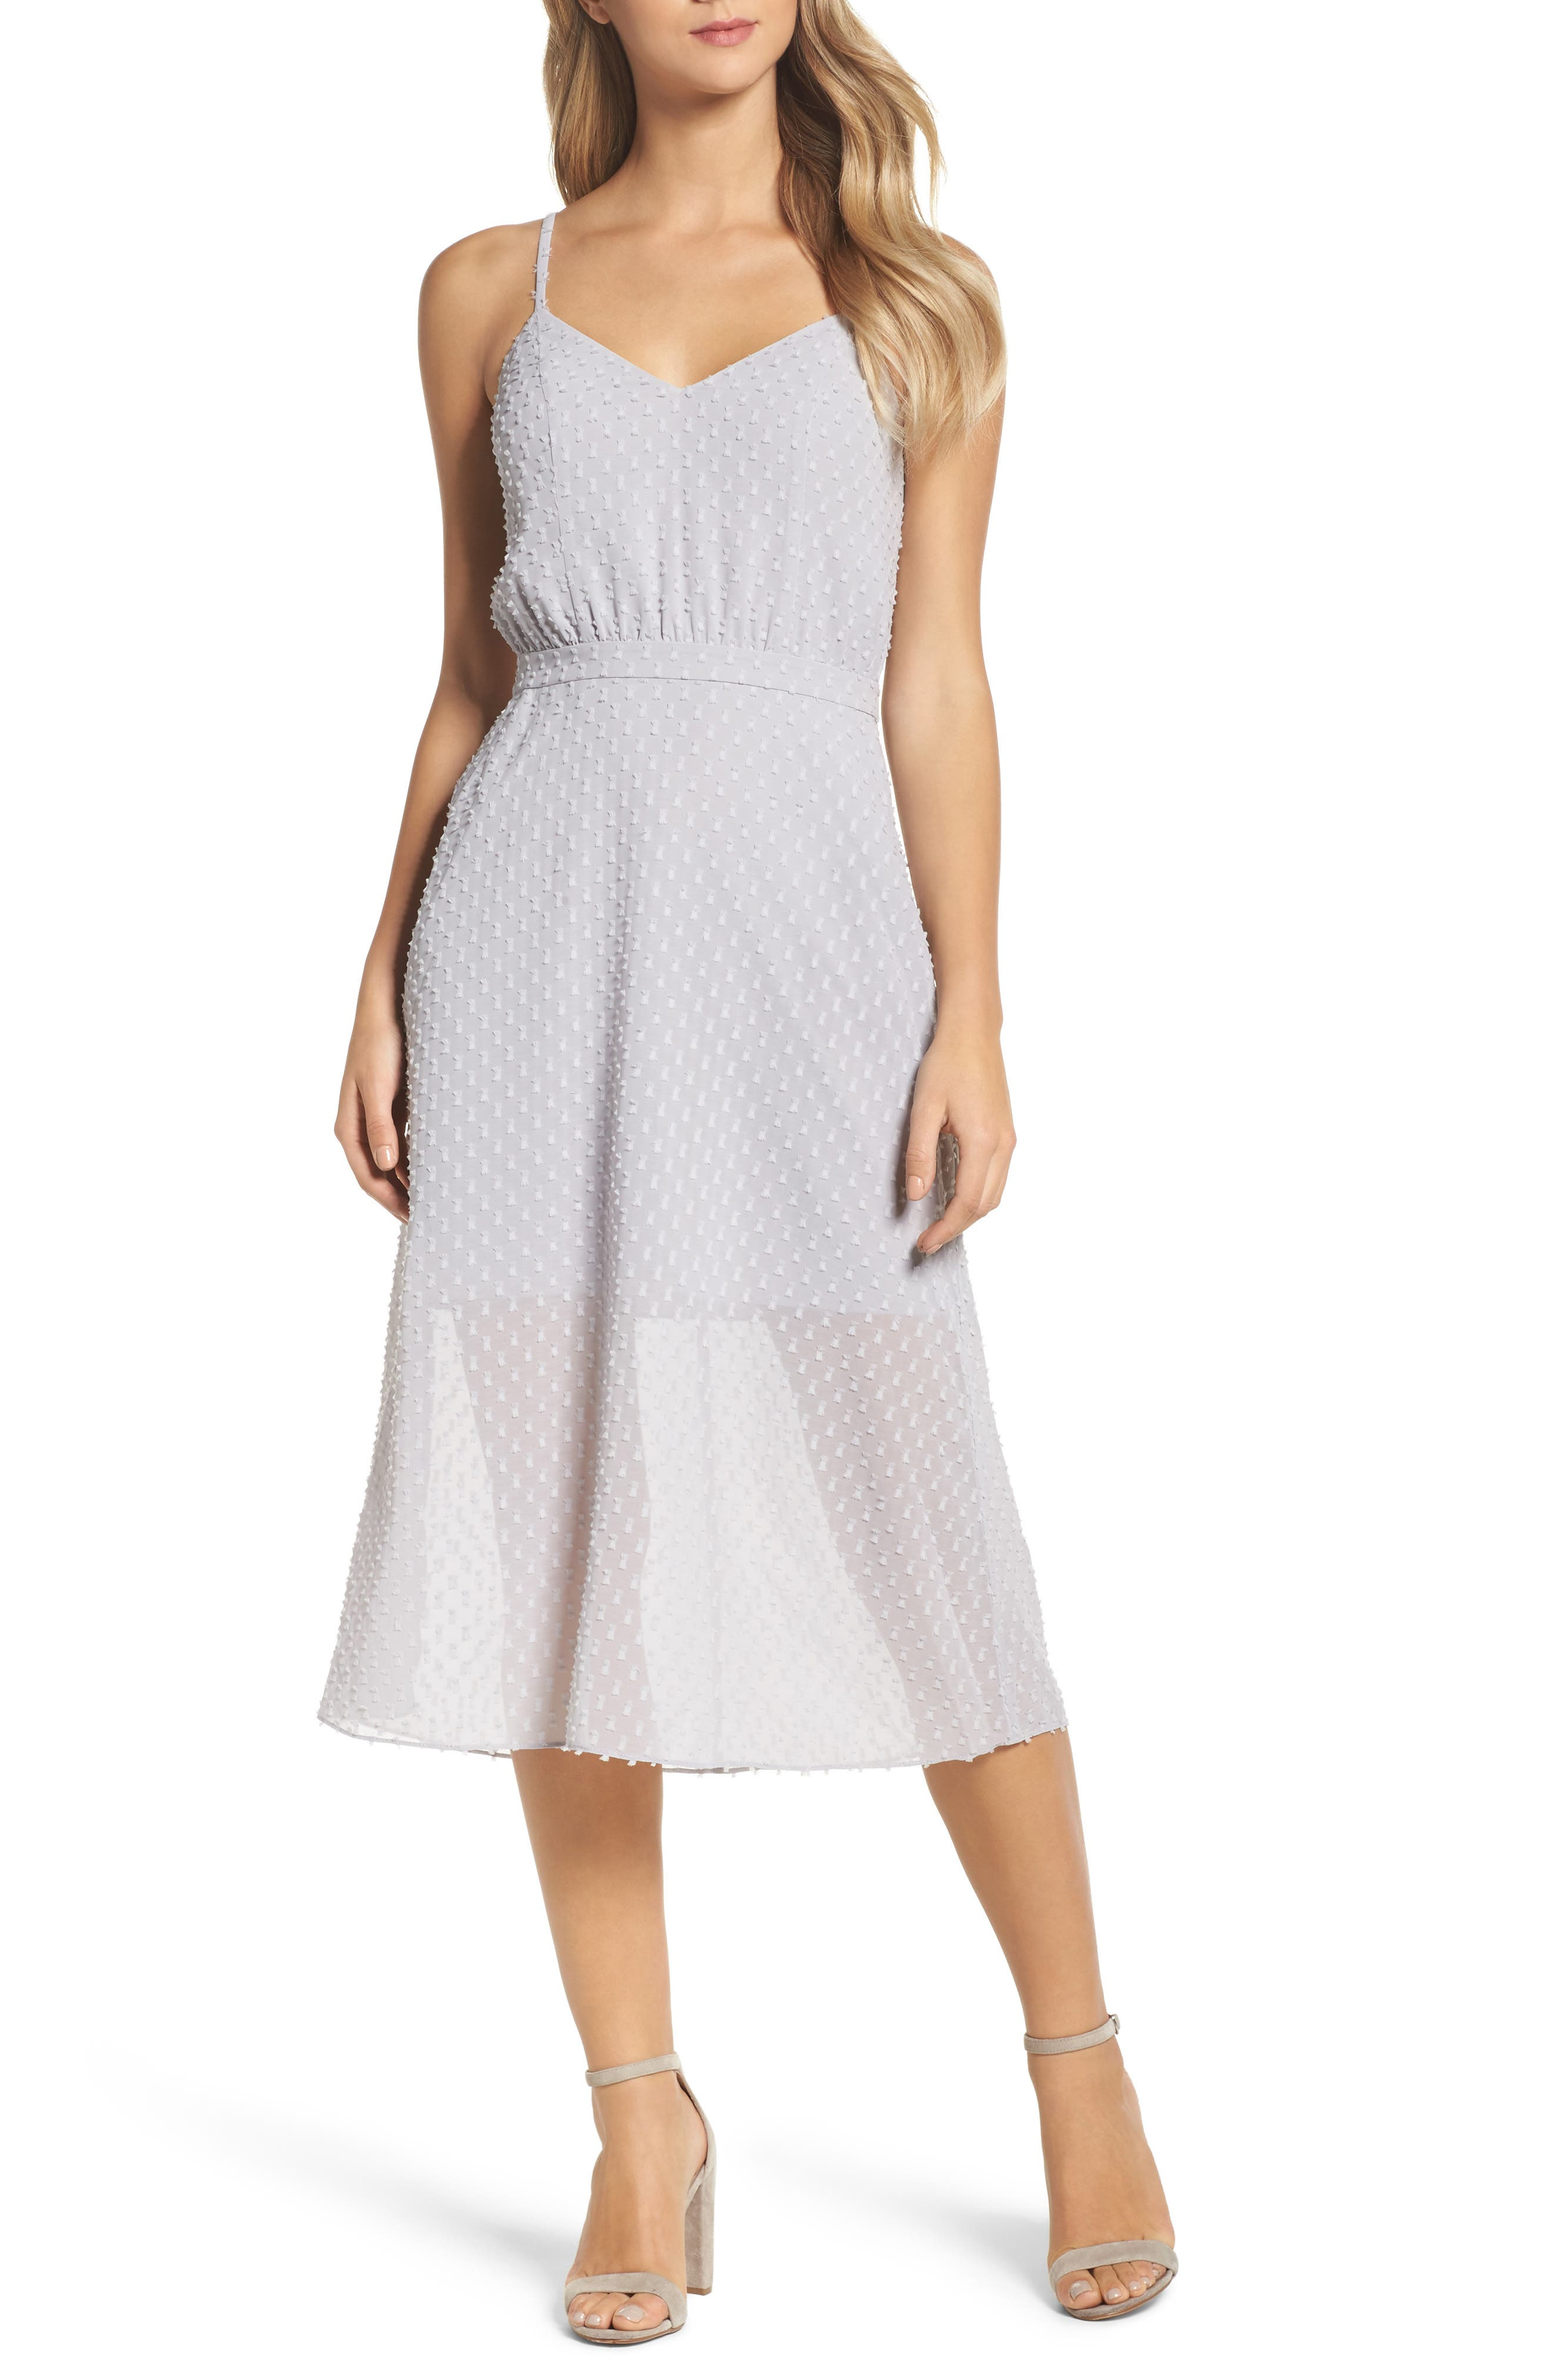 Bisou Bisou Midi Dress,                         Main,                         color, Dove Grey